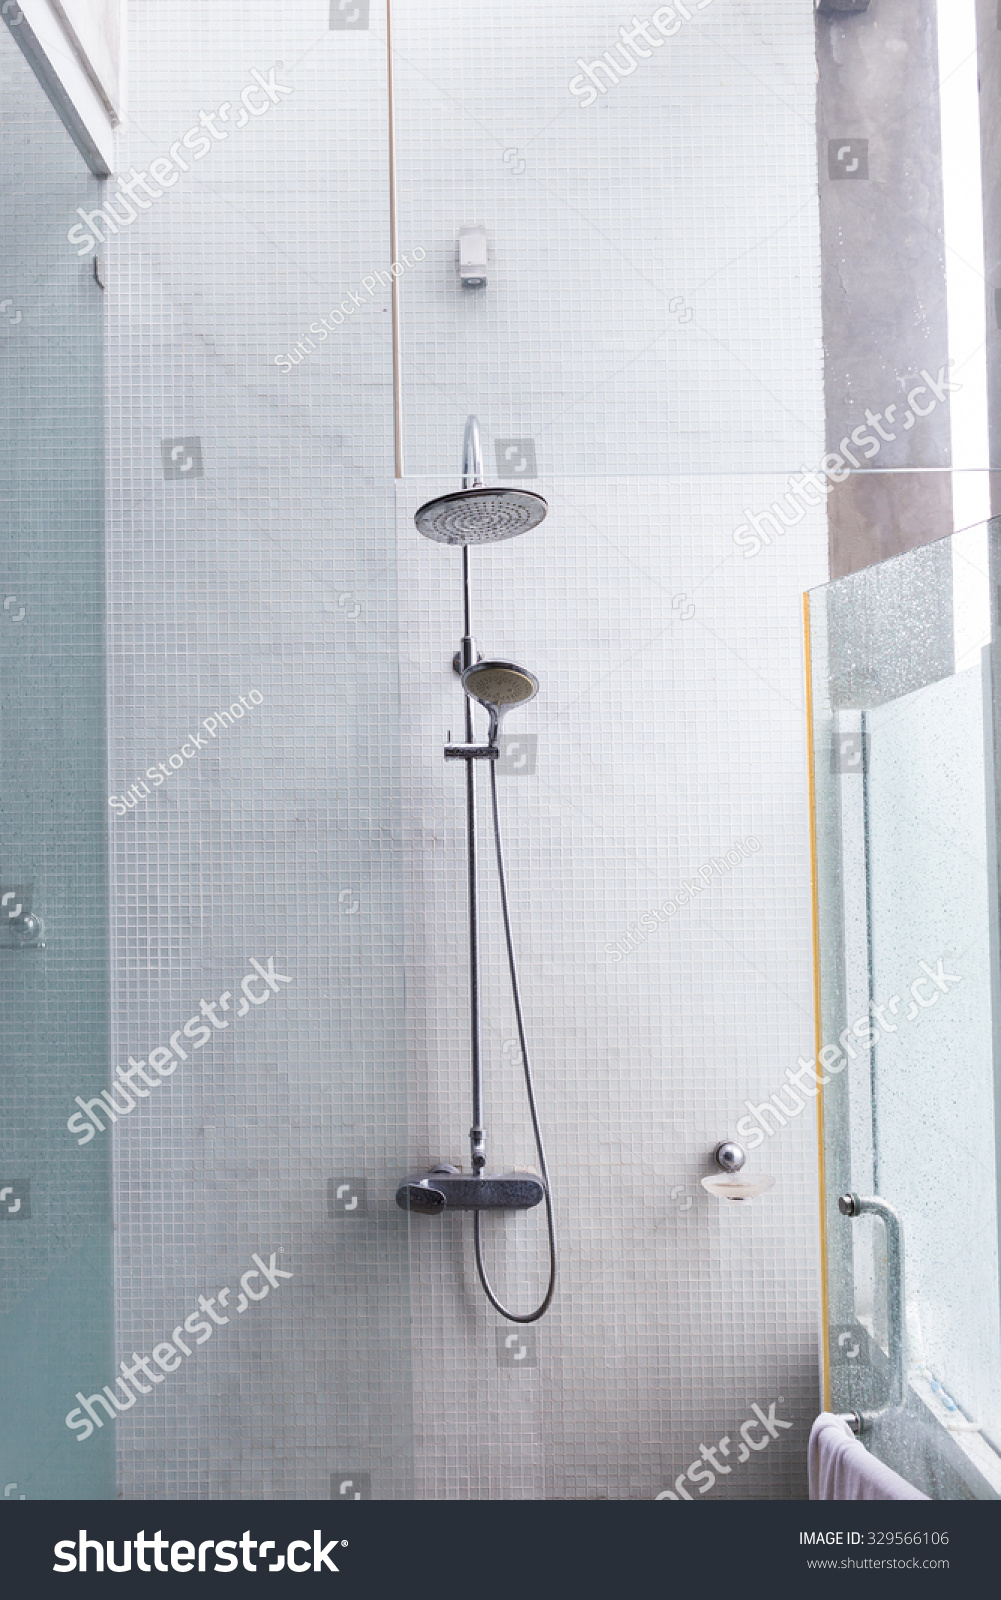 Shower Head Bathroom Design Home Interior Stock Photo & Image ...